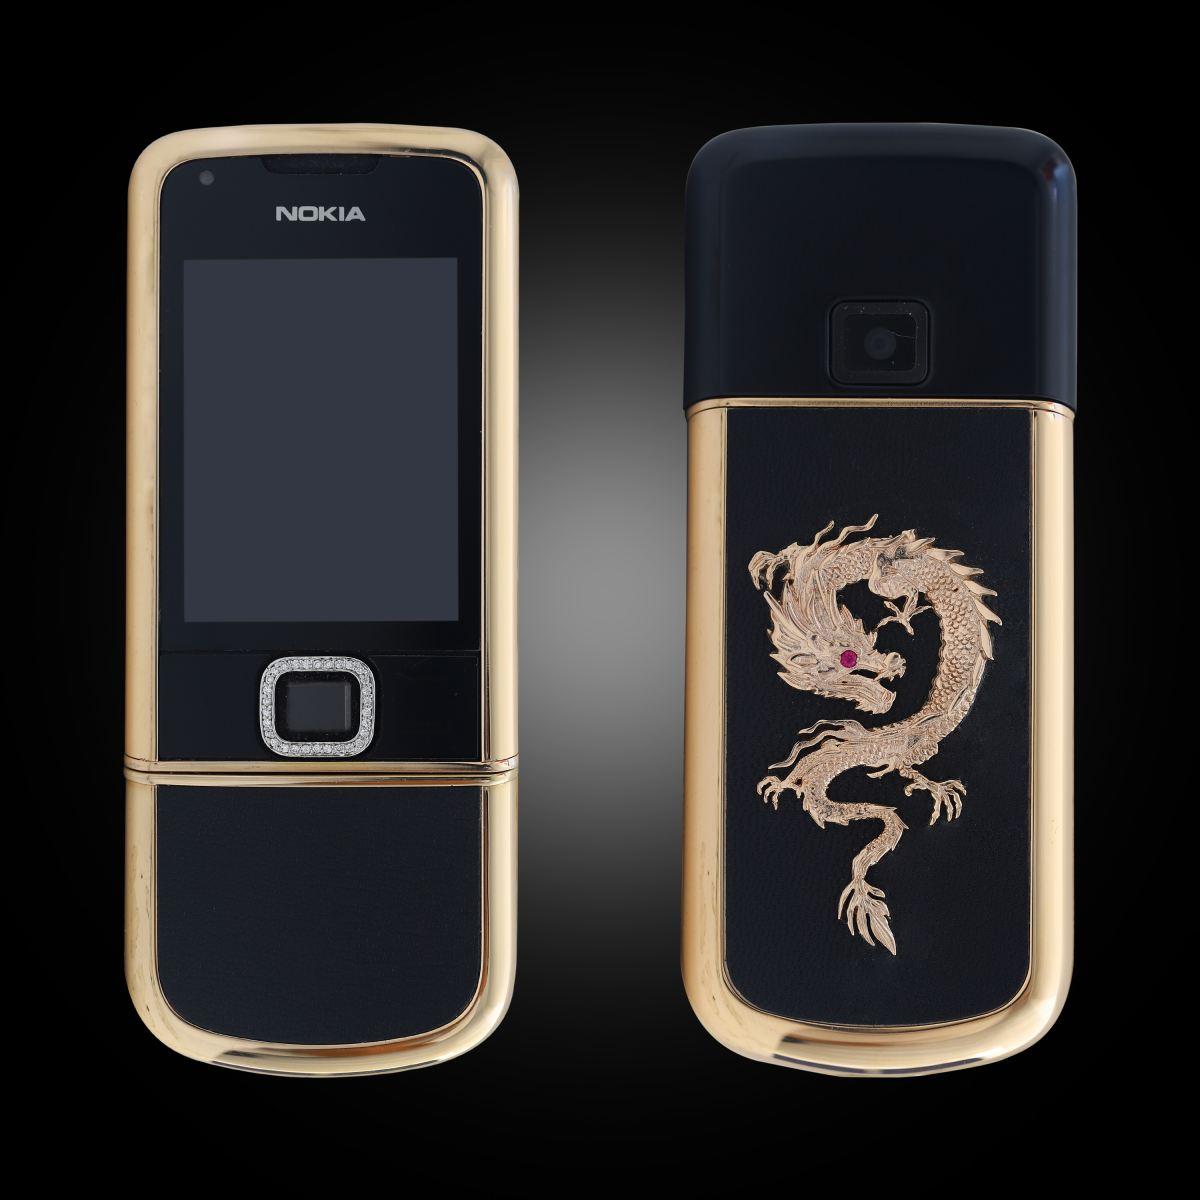 Nokia 8800 Rose Gold diem da da den rong 1